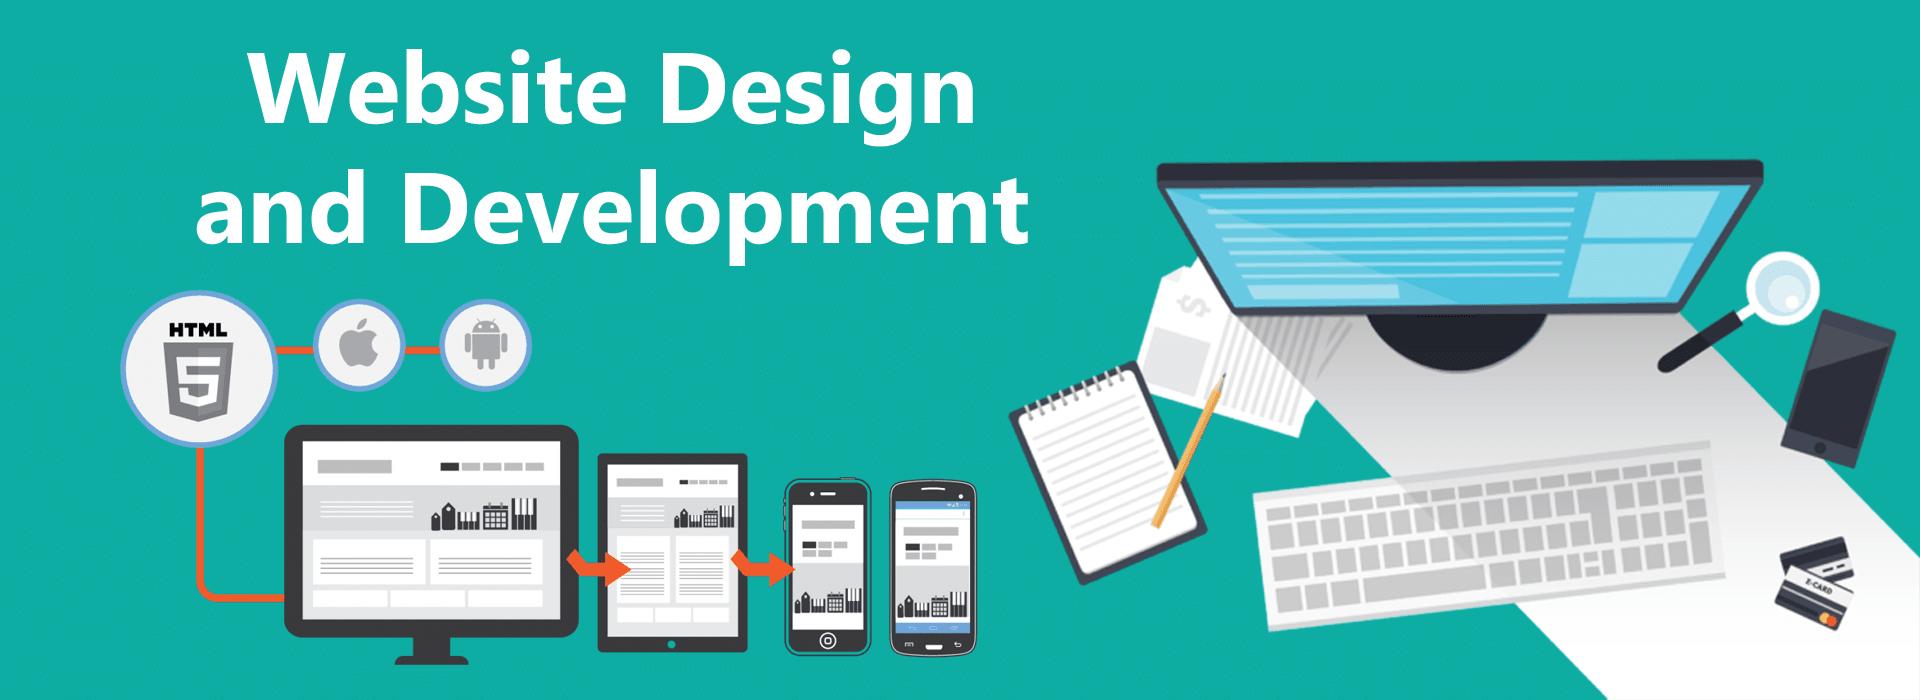 website design development